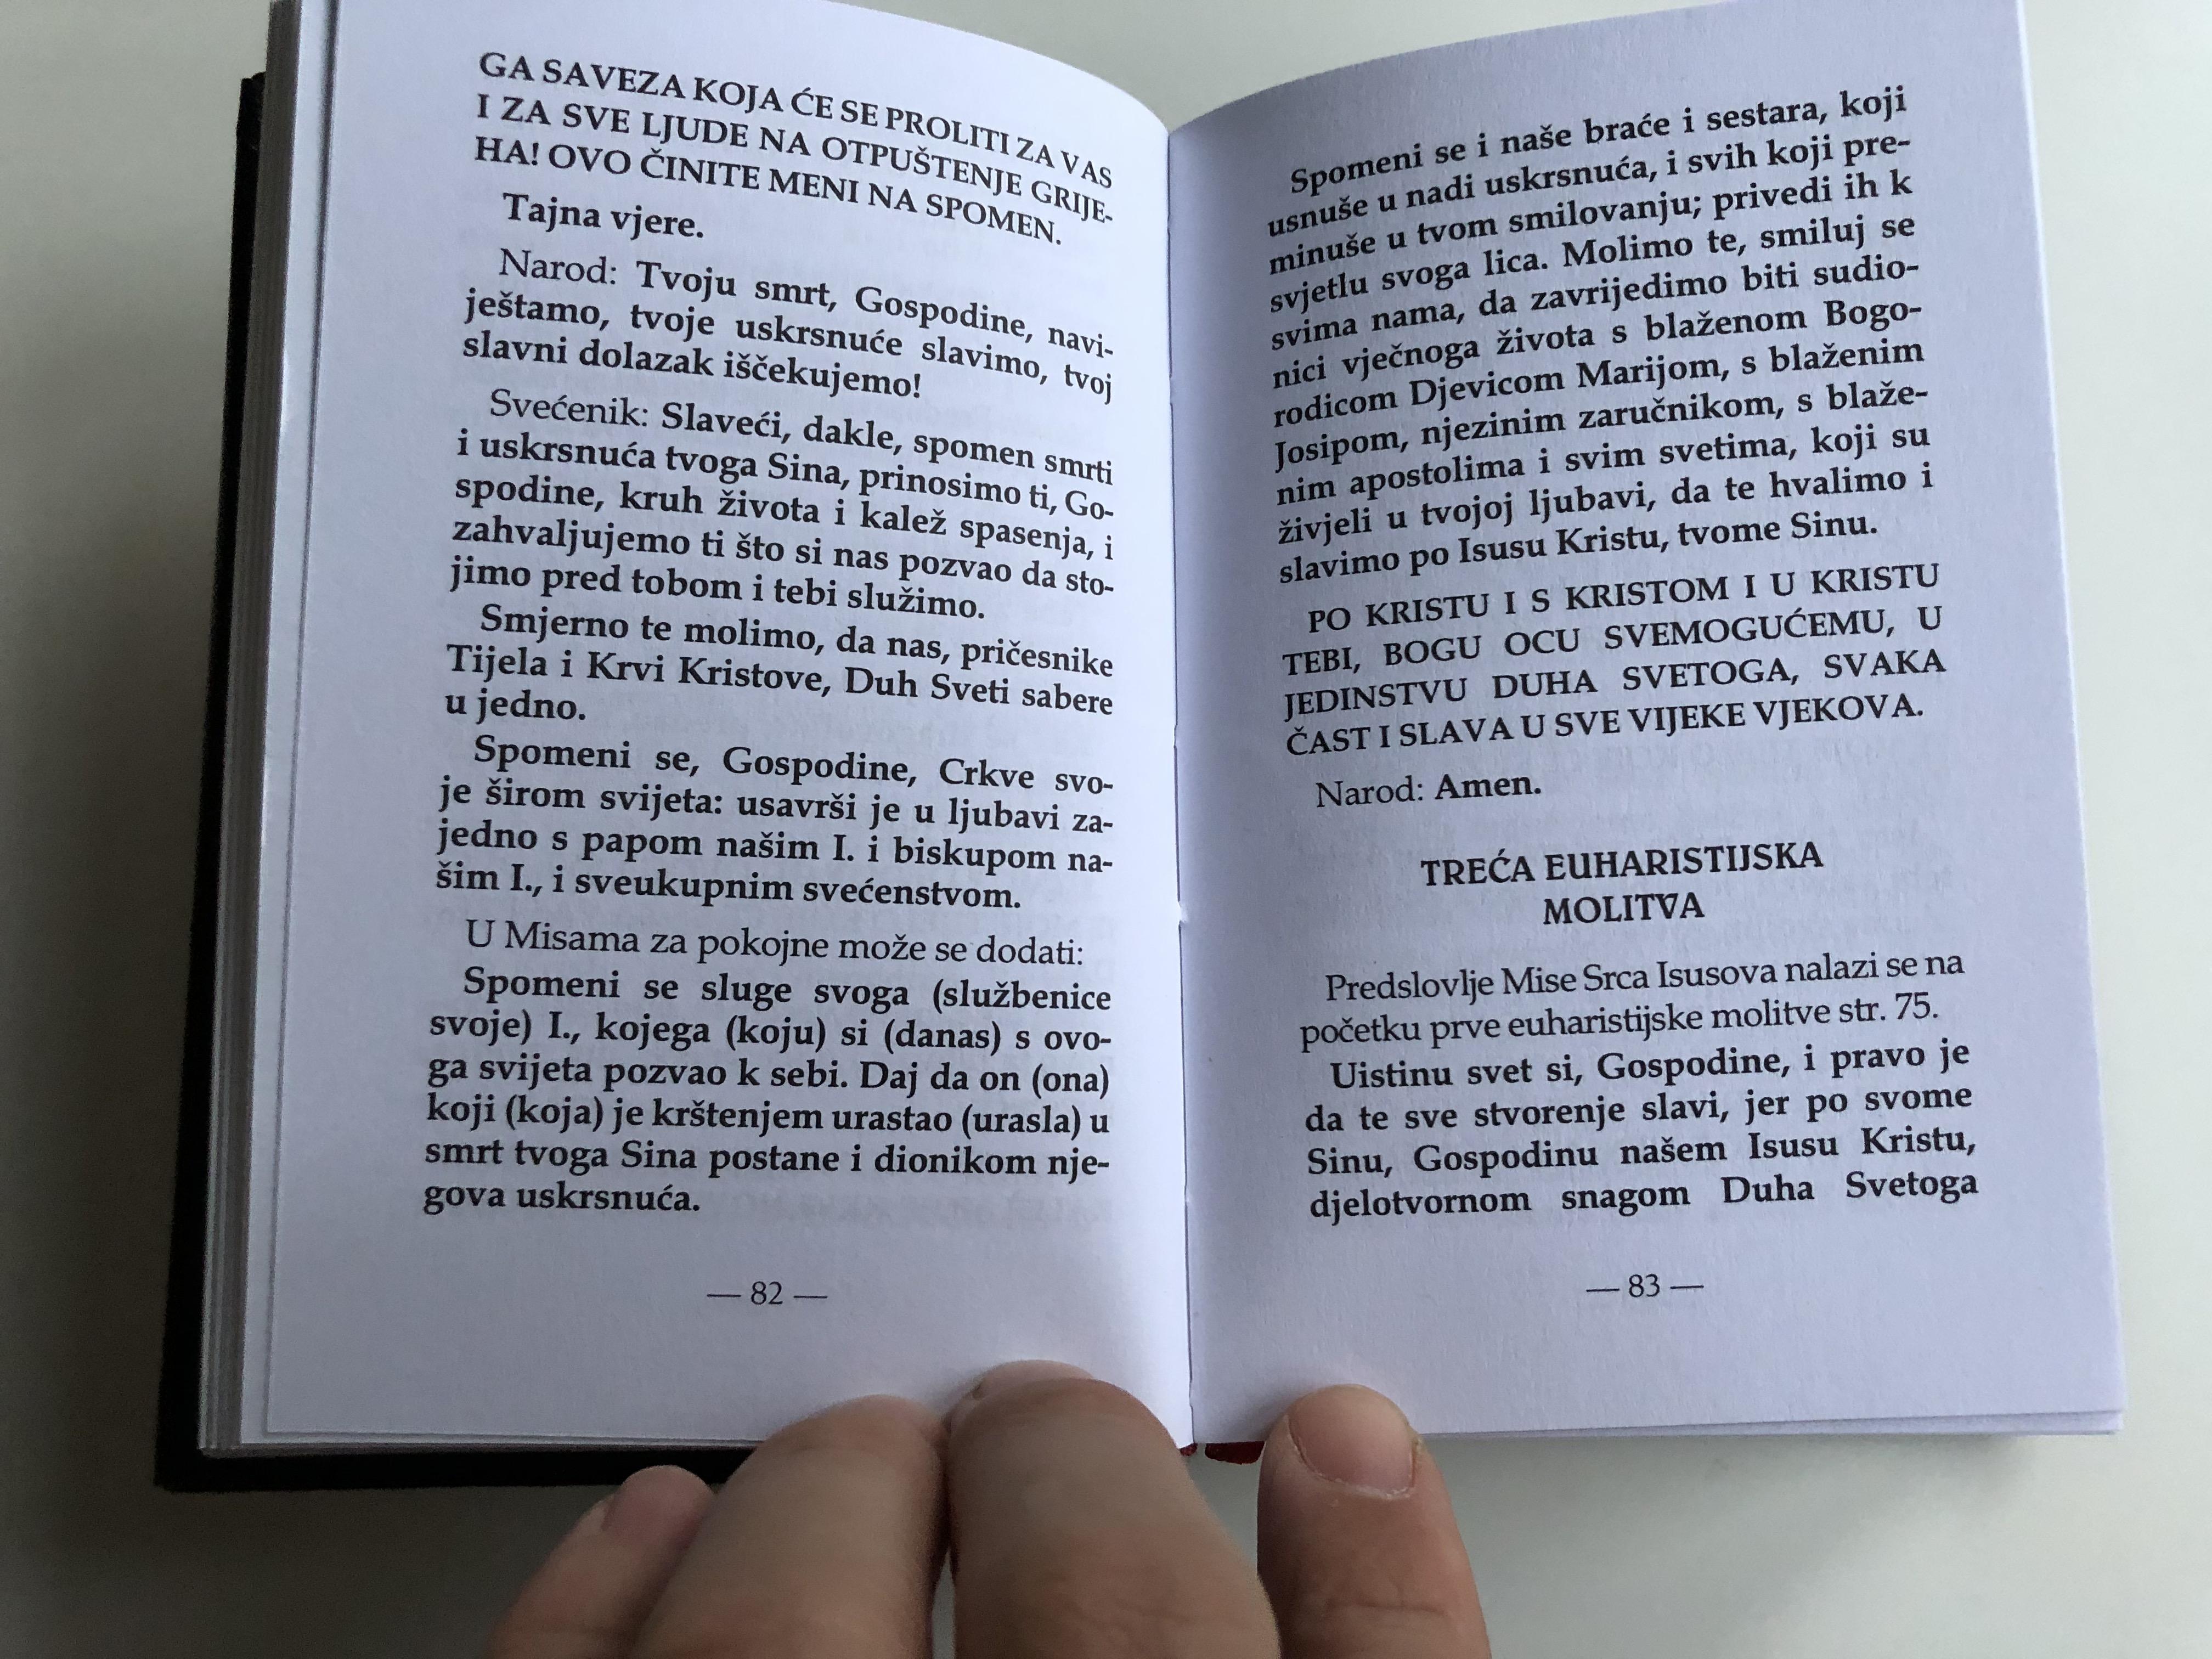 srce-isusovo-spasenje-na-e-croatian-language-prayer-book-8.jpg